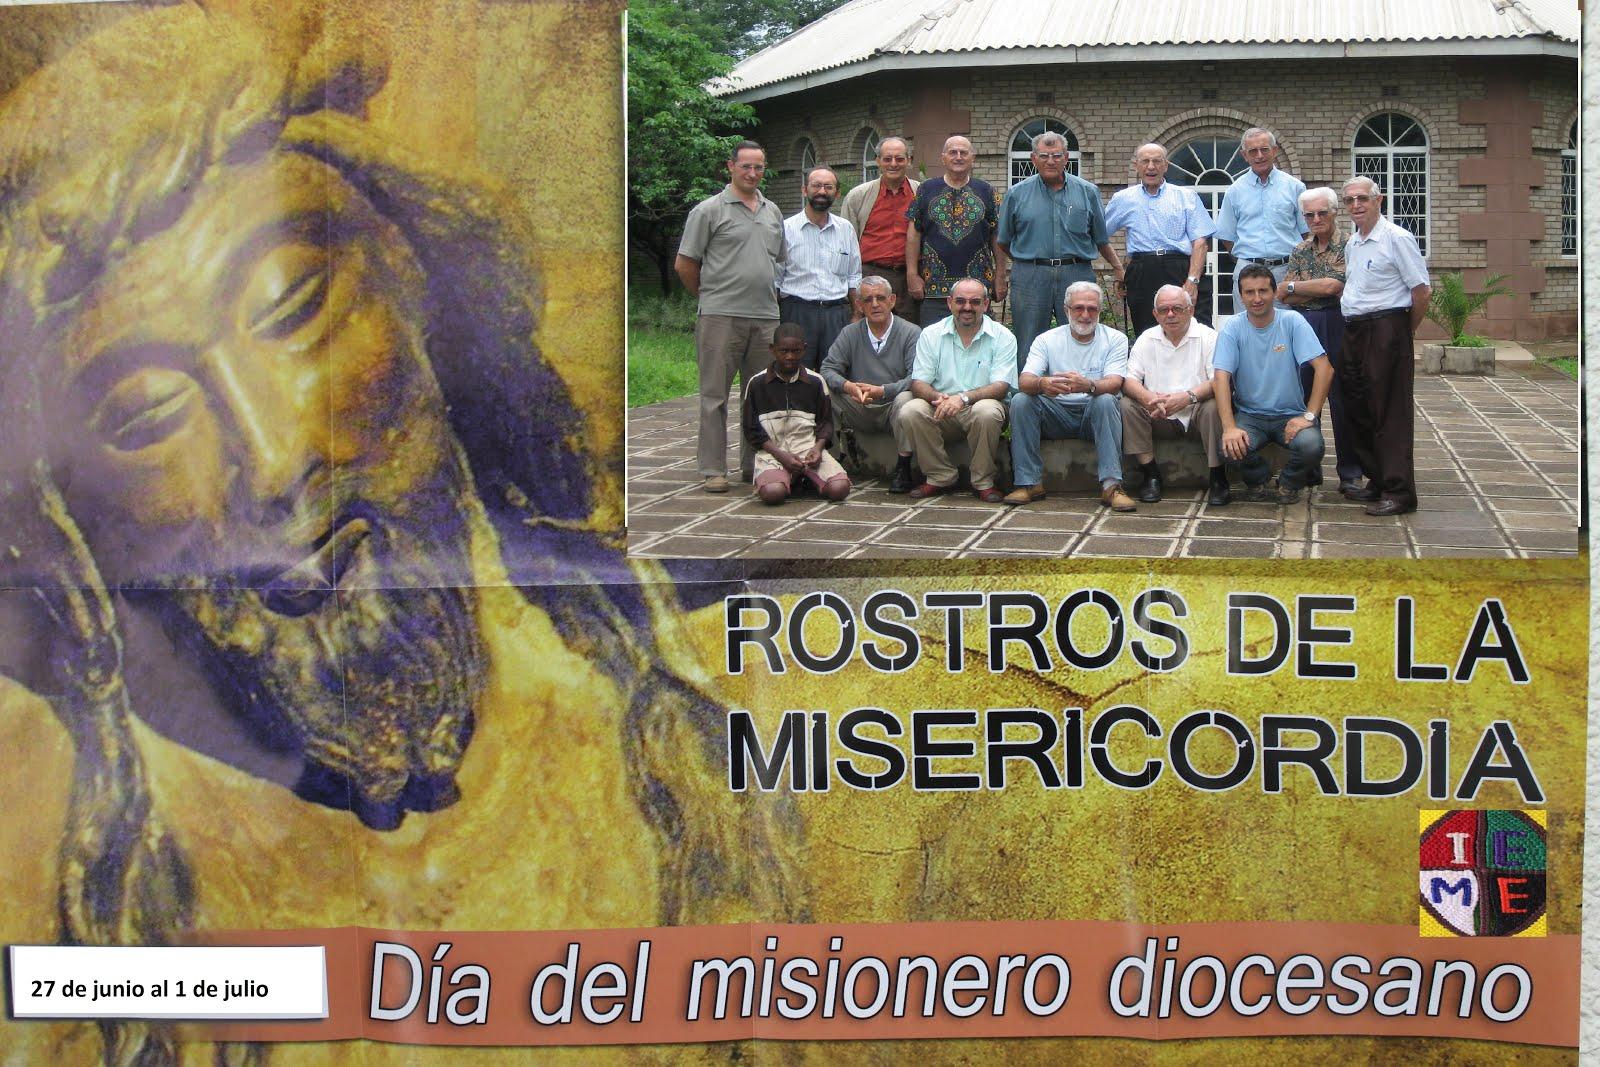 ROSTROS DE LA MISERICORDIA